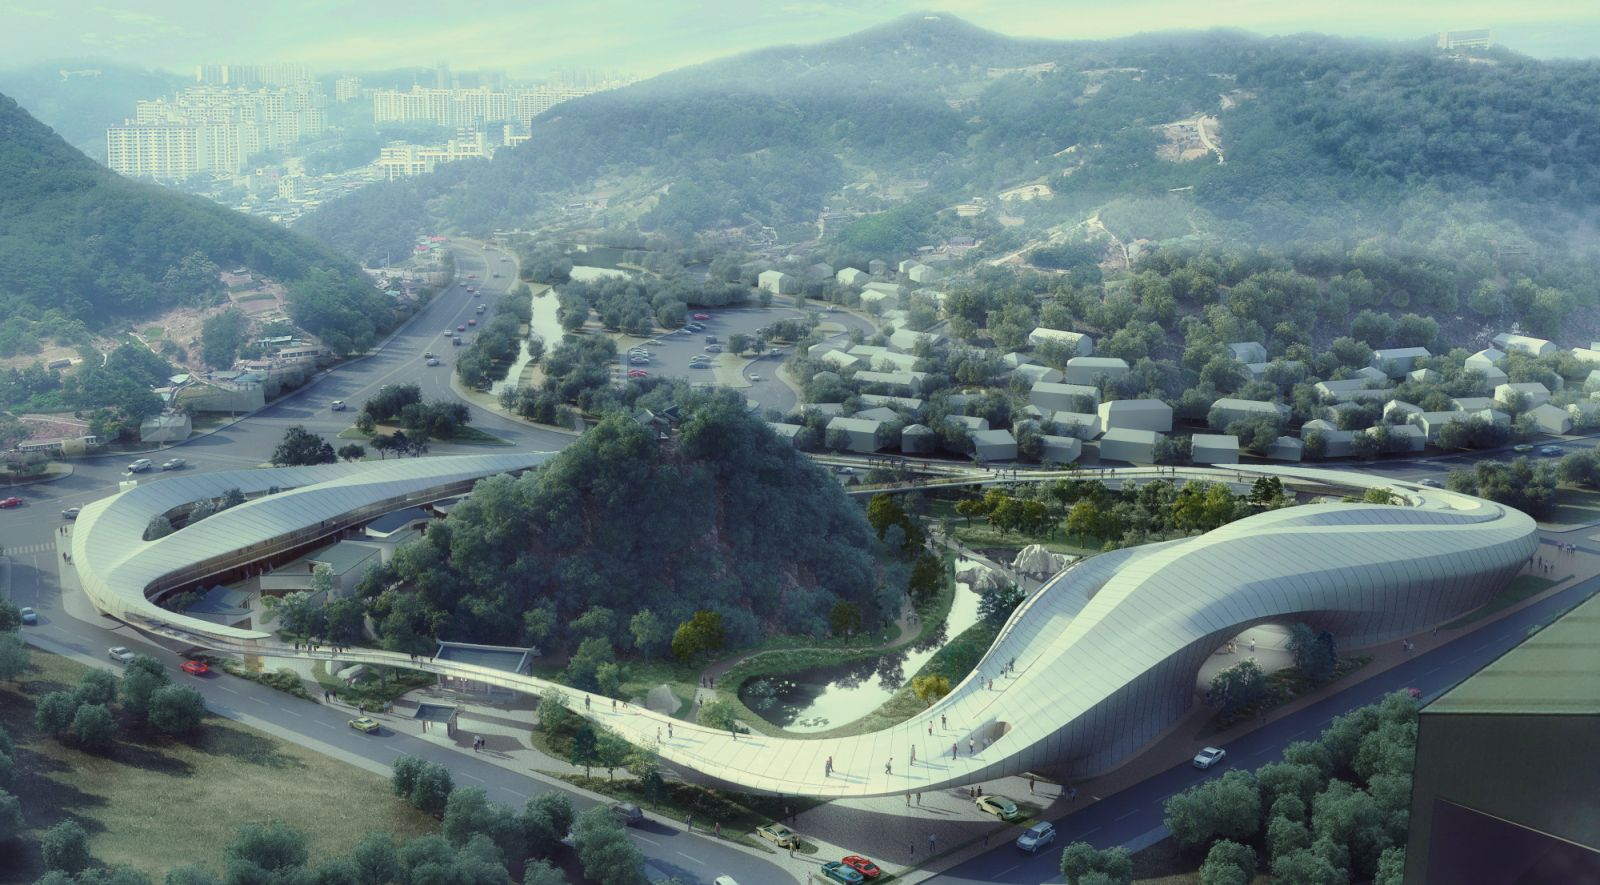 Cloud Garden Of General Yisabu By Caa Architects 00